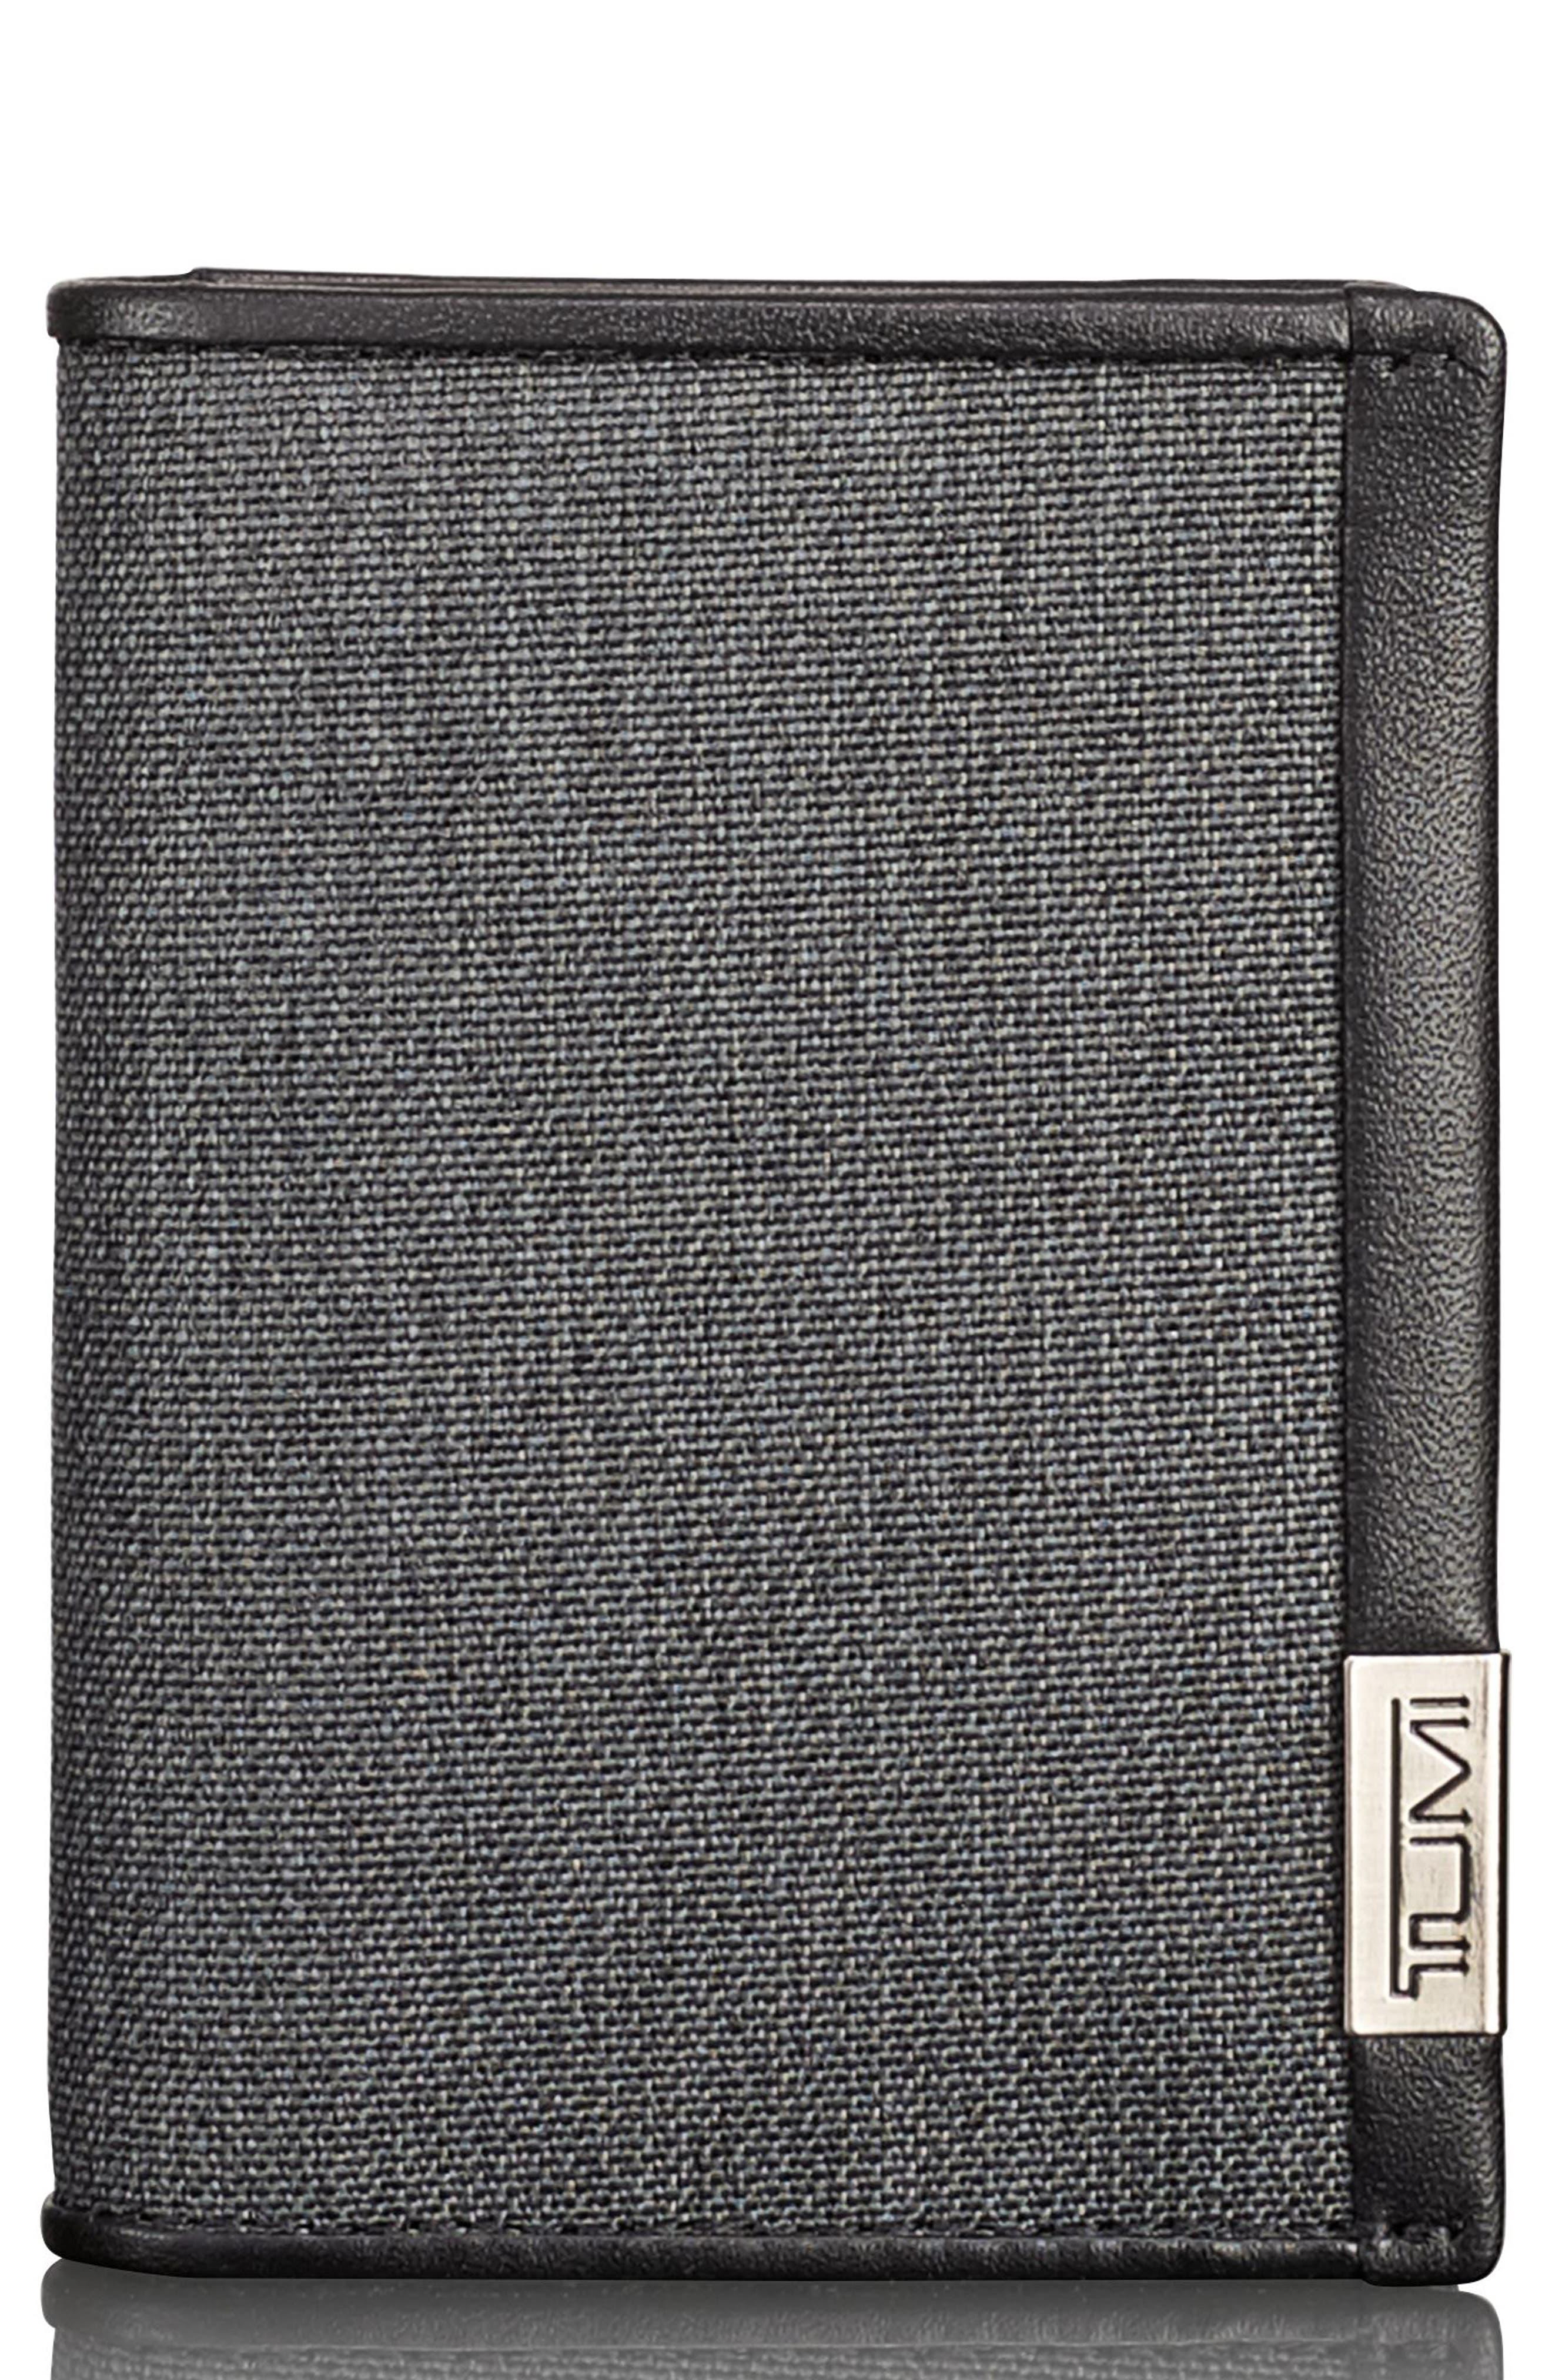 Alpha Card Case,                             Main thumbnail 1, color,                             Anthracite/ Black